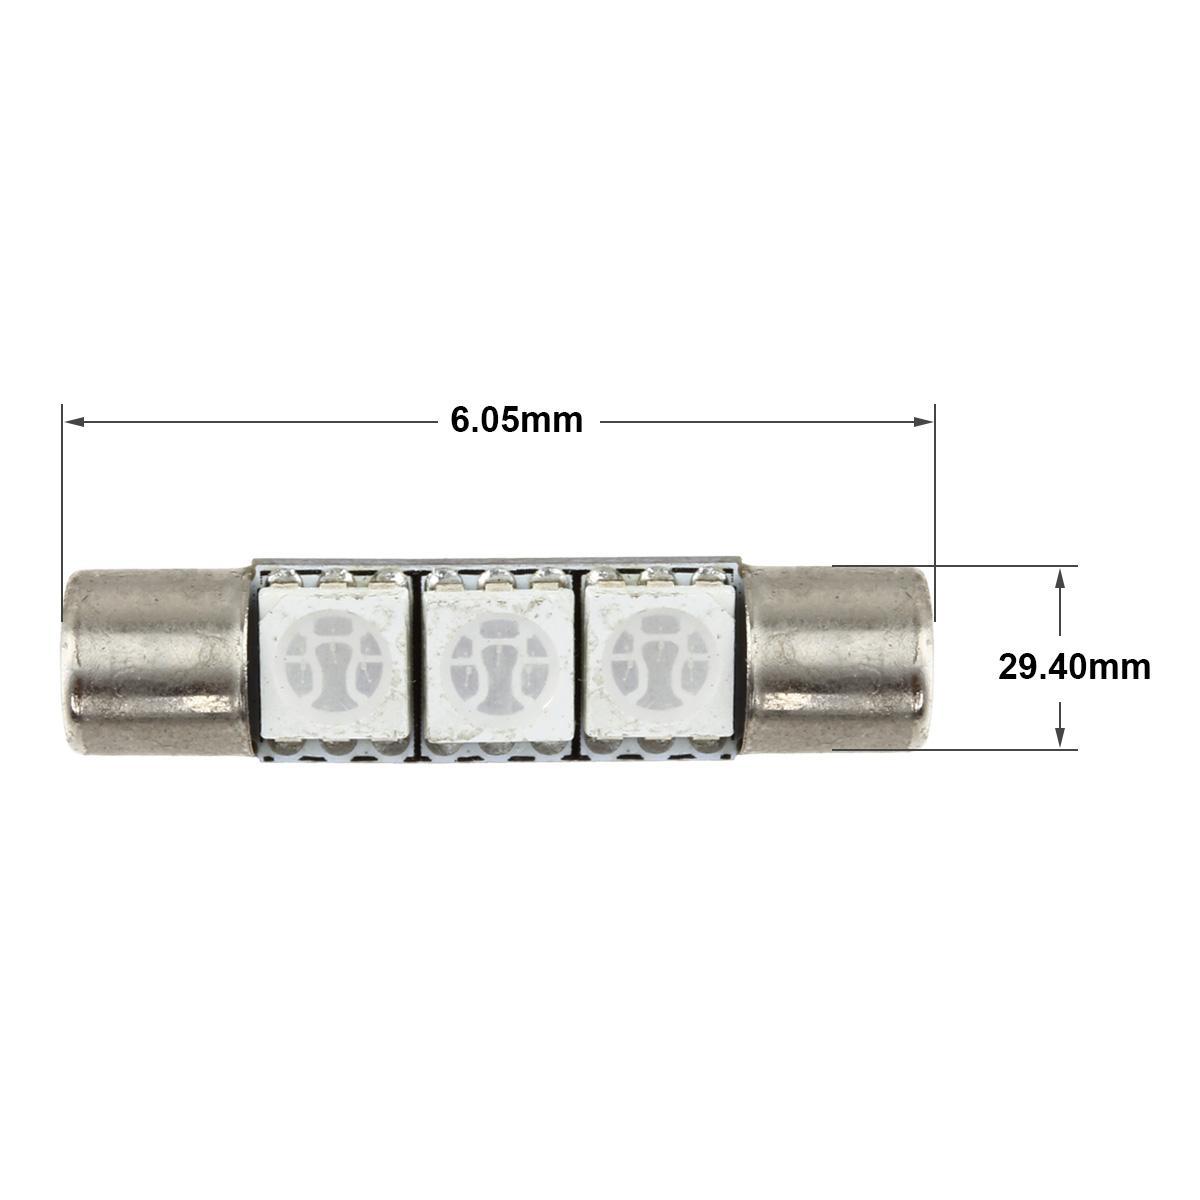 8 xenon blue 3 5050 smd led bulbs for car vanity mirror lights sun visor la. Black Bedroom Furniture Sets. Home Design Ideas